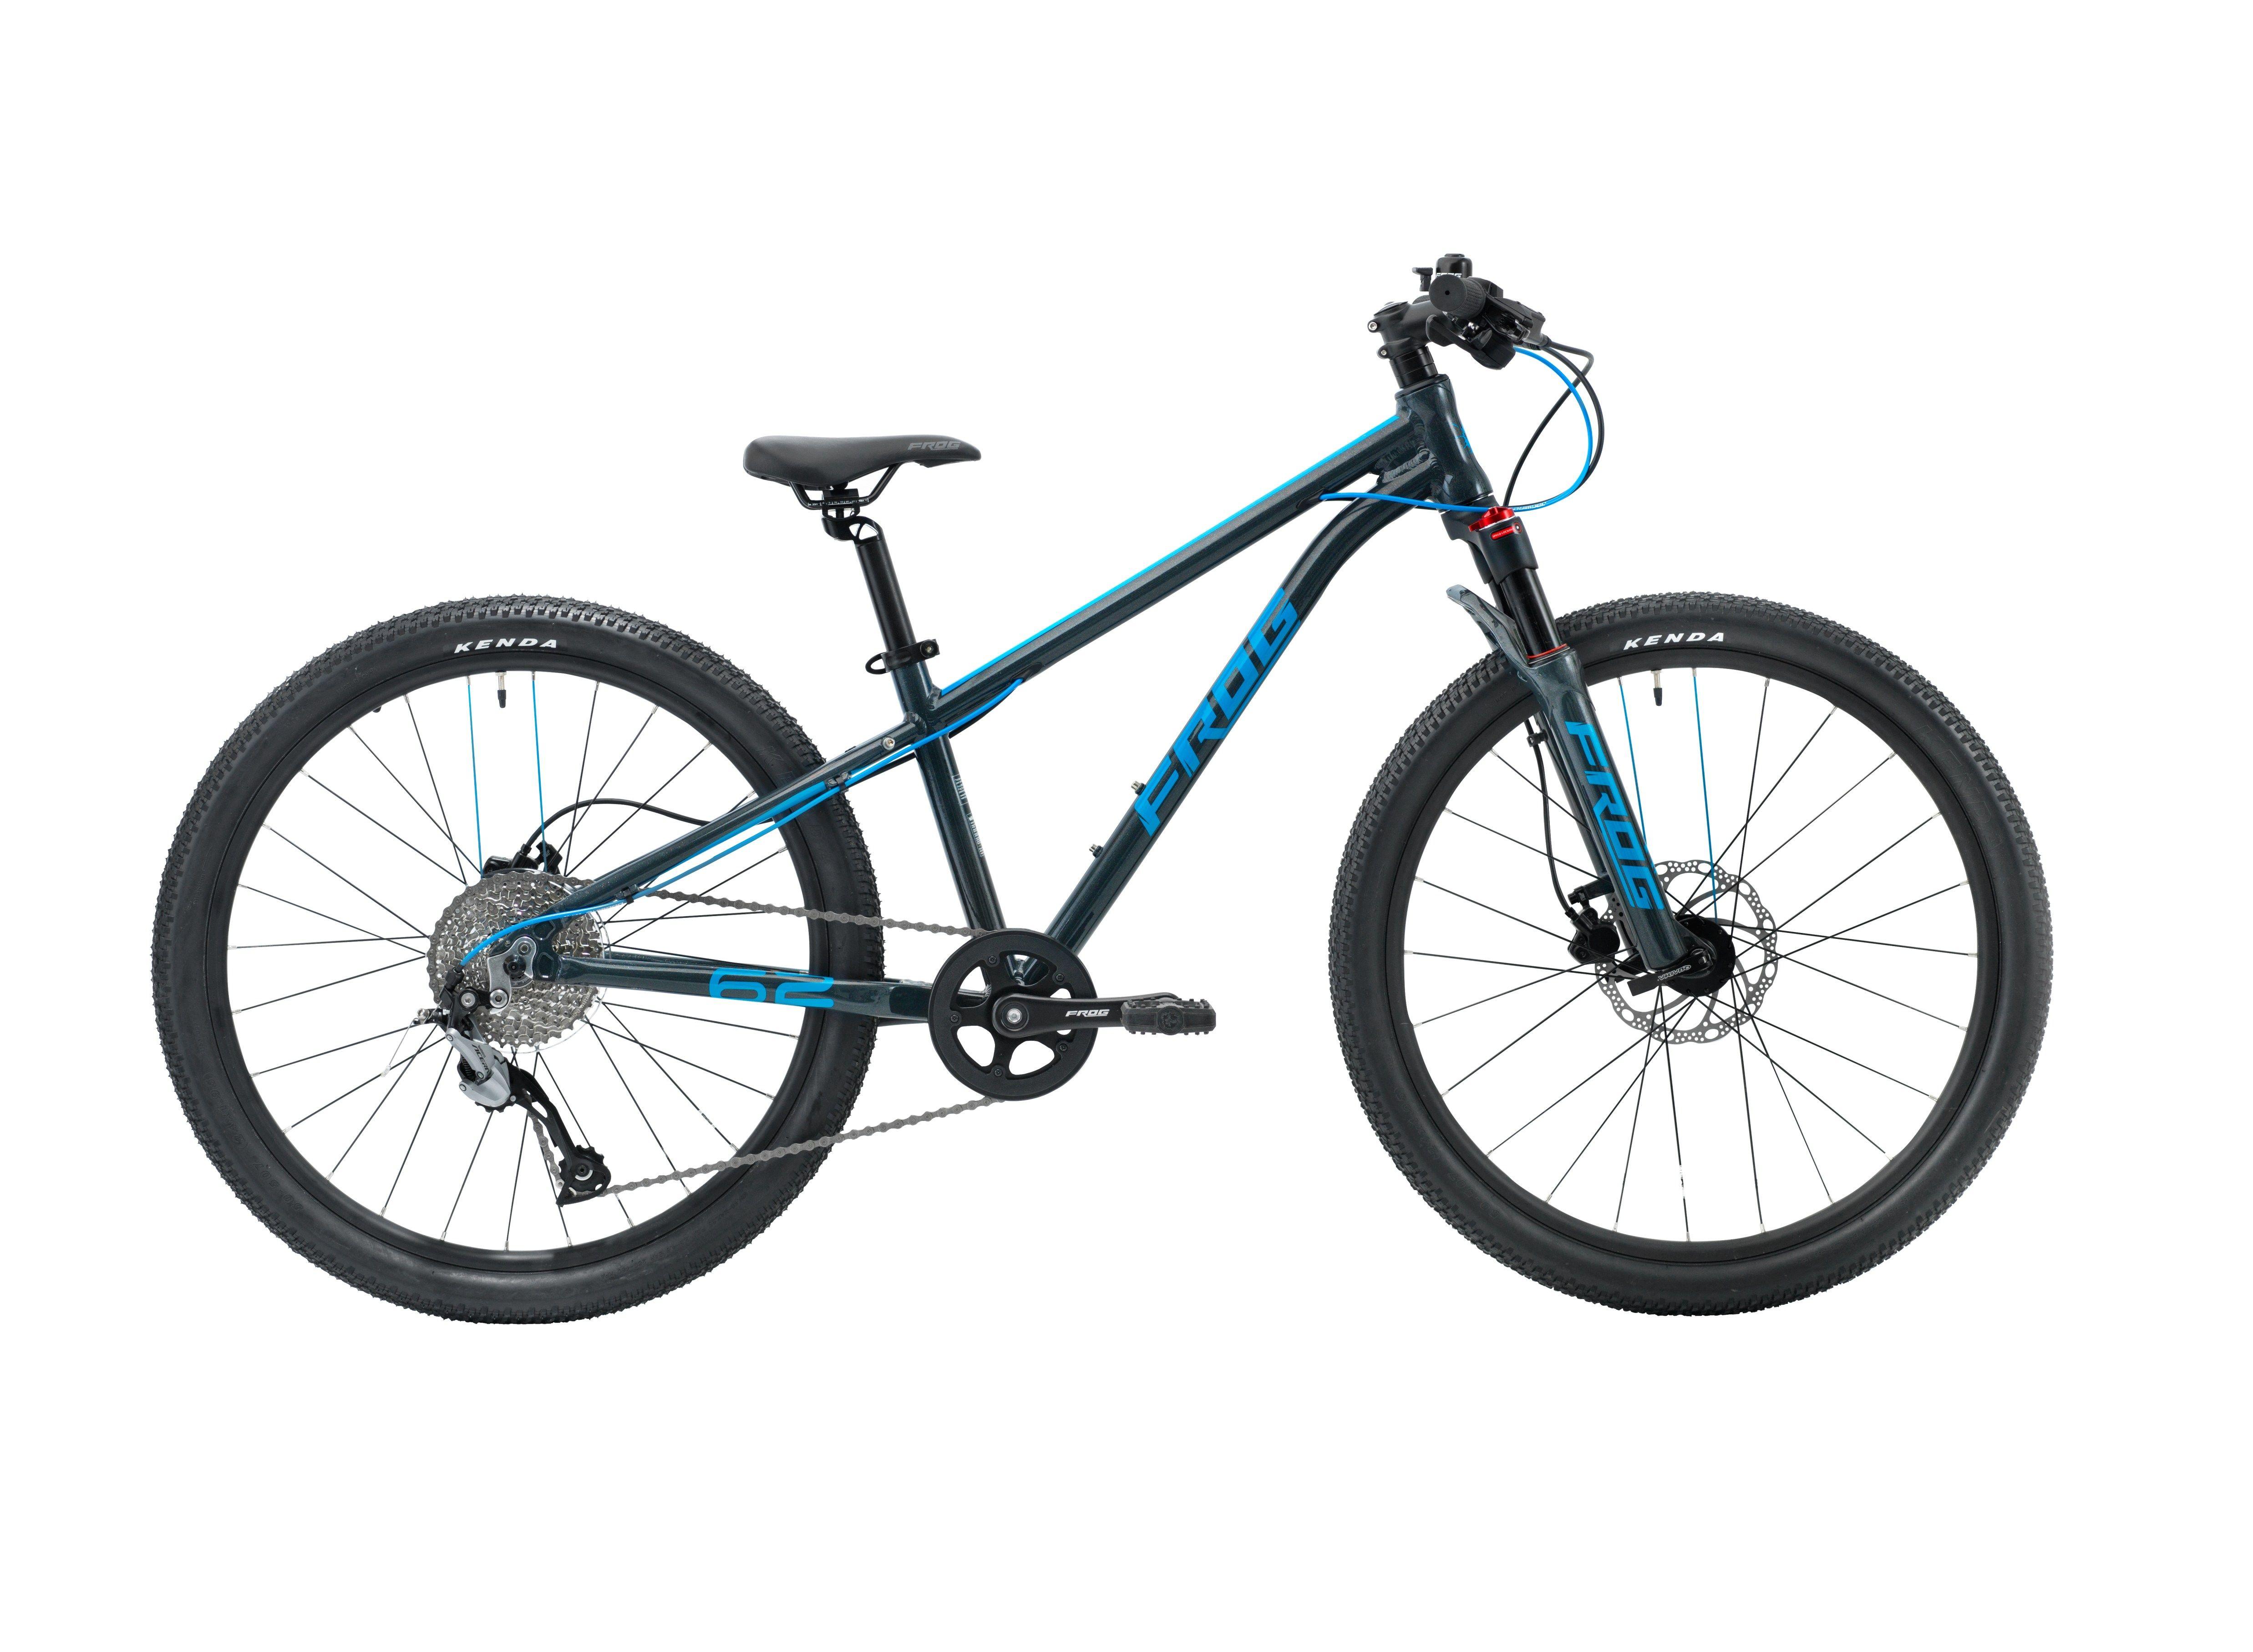 5 Best 26 Inch Mountain Bikes Xs 27 5 Inch Mountain Bikes For Kids Rascal Rides Frog Bikes 26 Mountain Bike Mountain Bike Frames